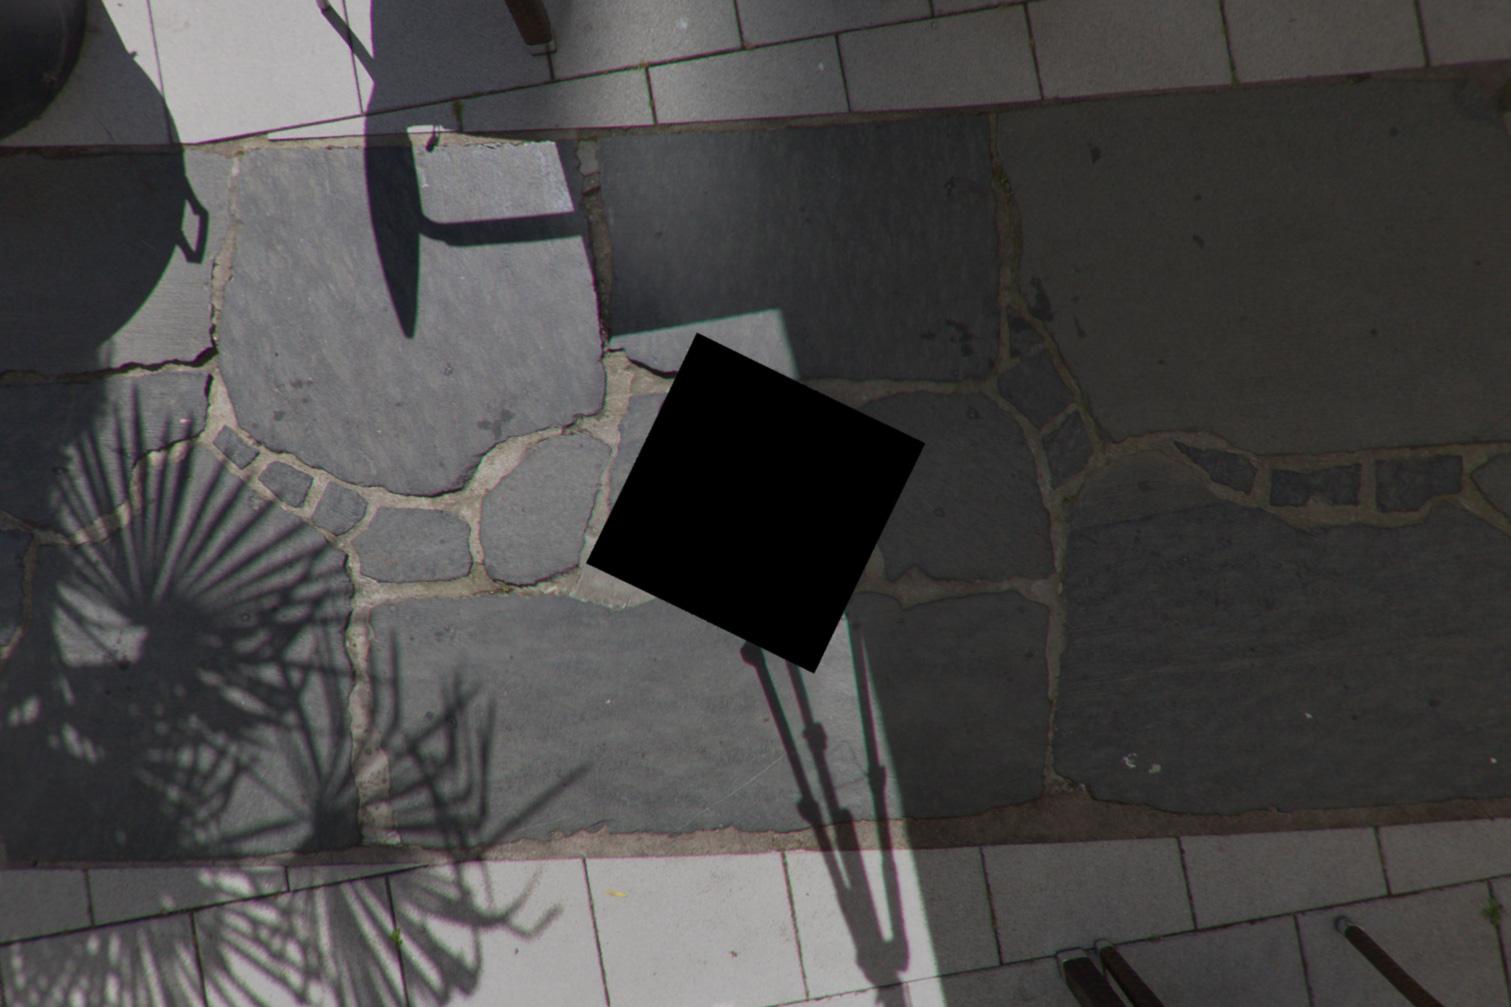 Panorama Stitching Service ohne Nadir